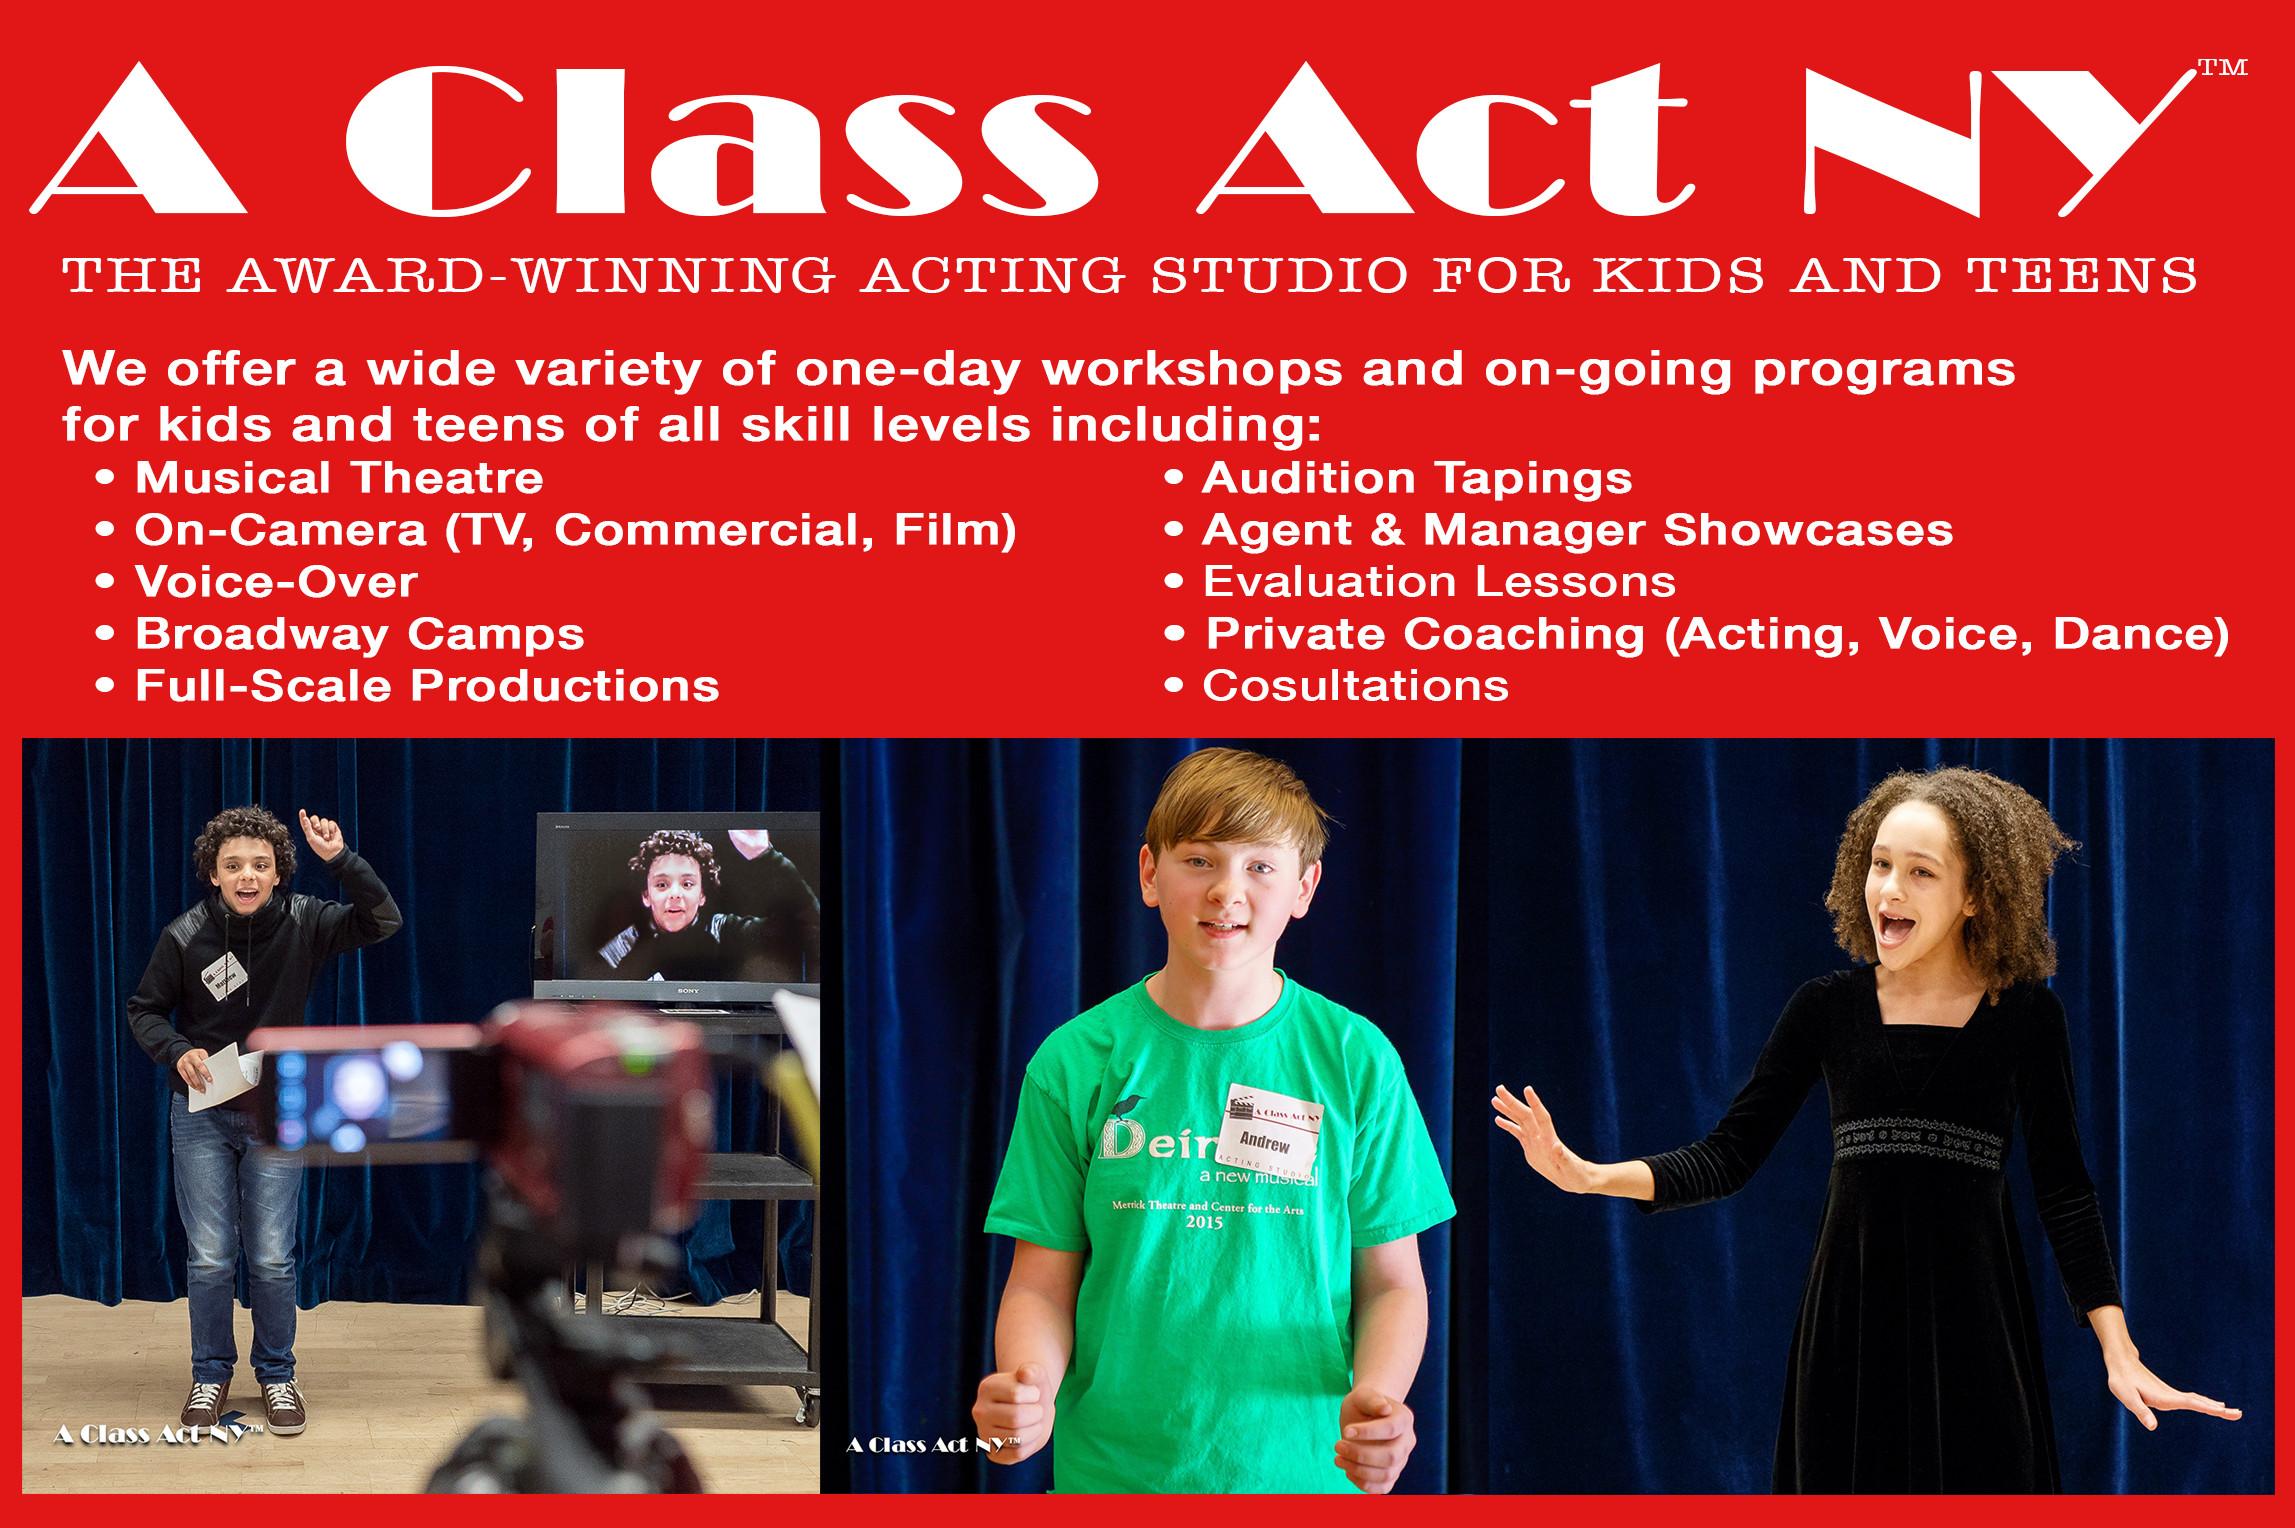 A Class Act NY - The Award-Winning Acting Studio